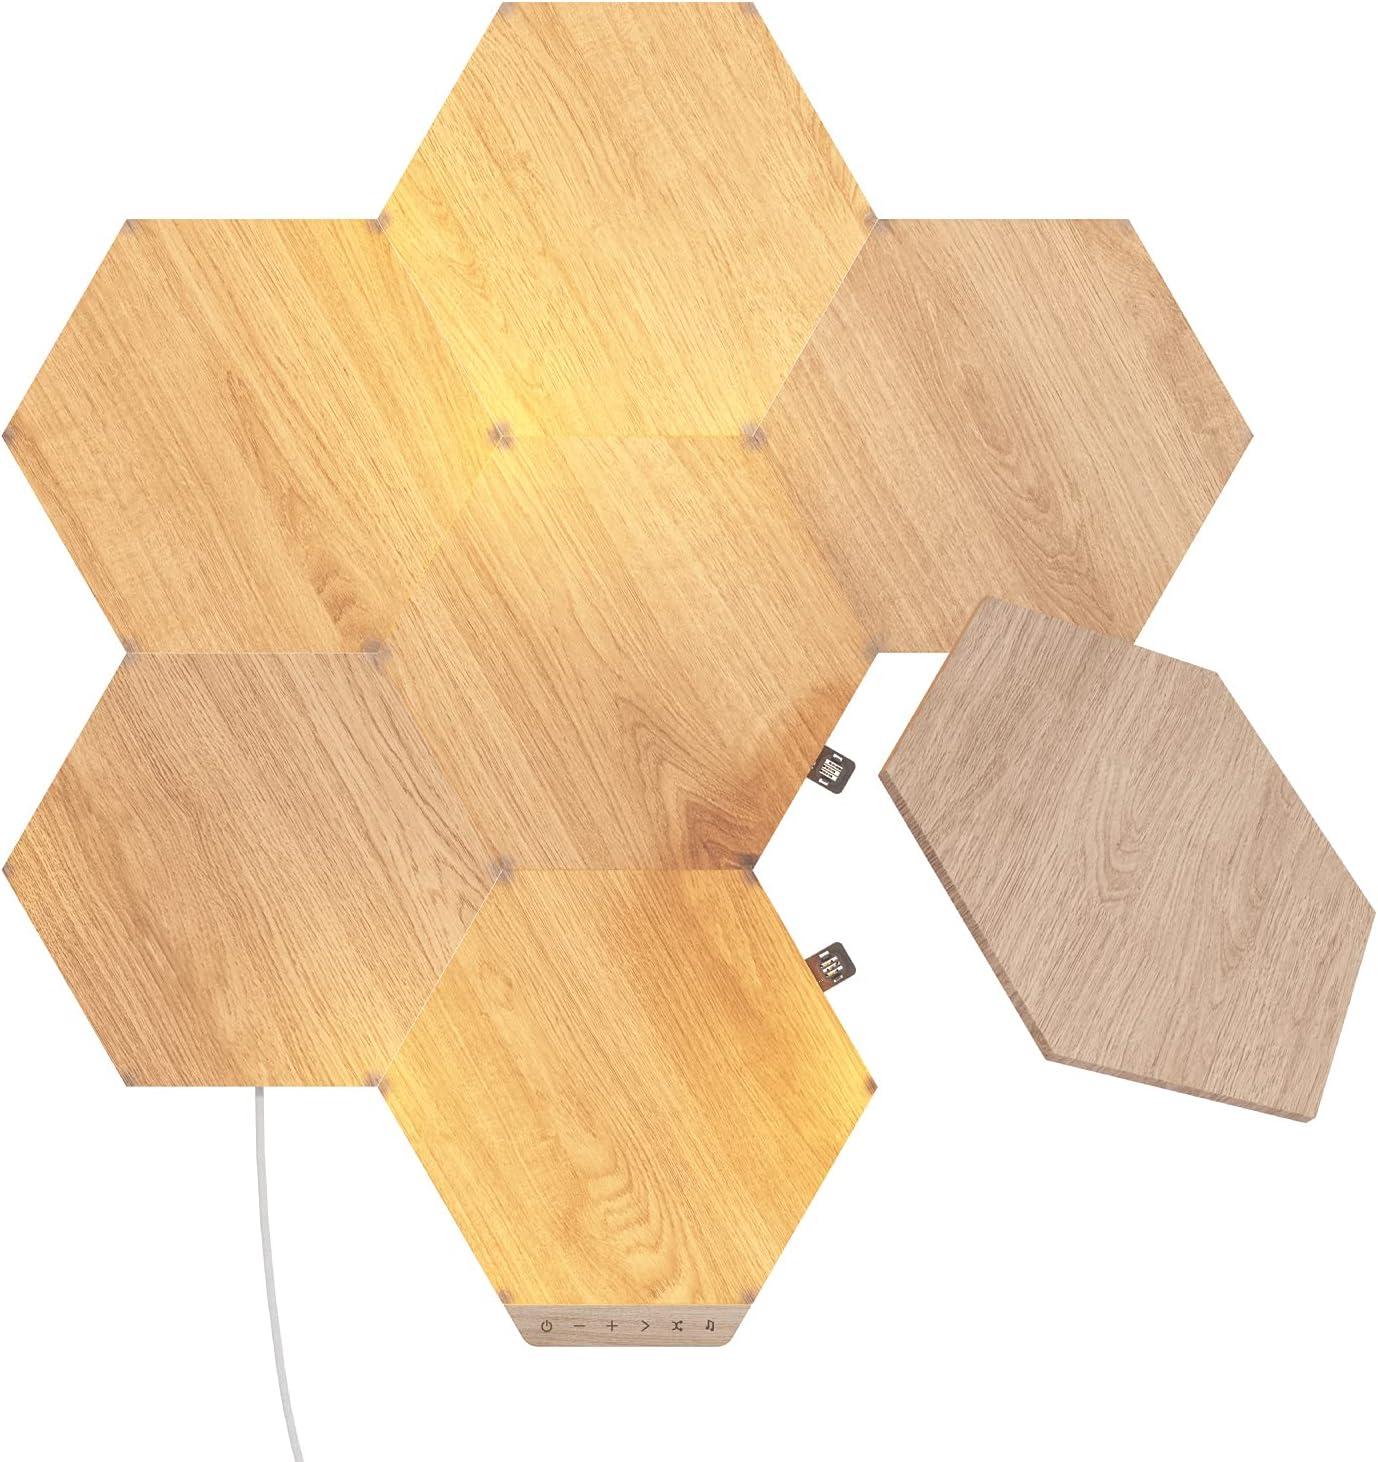 Nanoleaf Elements Hexágonos Efecto Madera Starter Kit - 7 Panels Luminosos